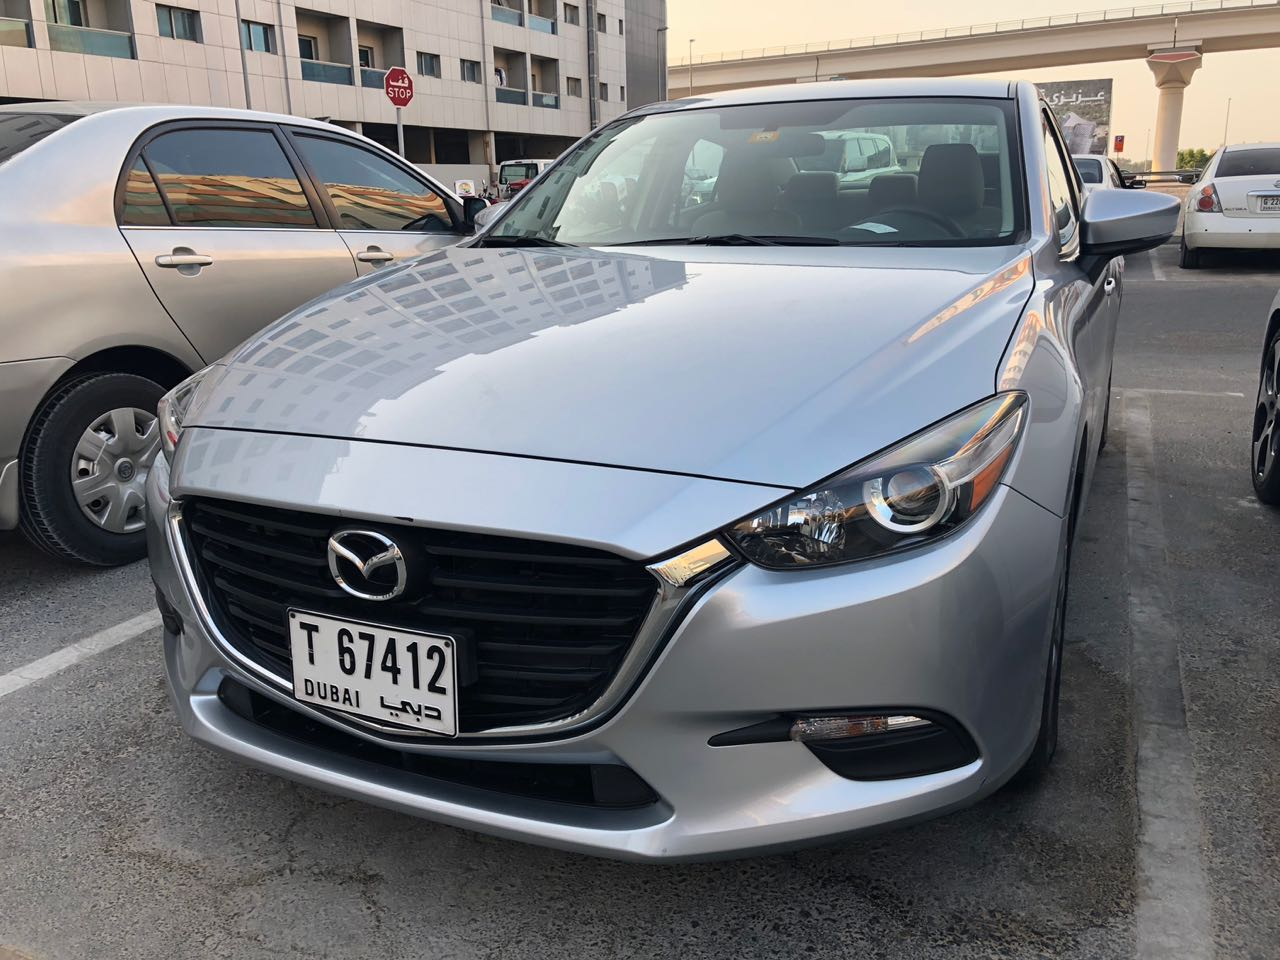 Kelebihan Kekurangan Mazda 2017 Murah Berkualitas